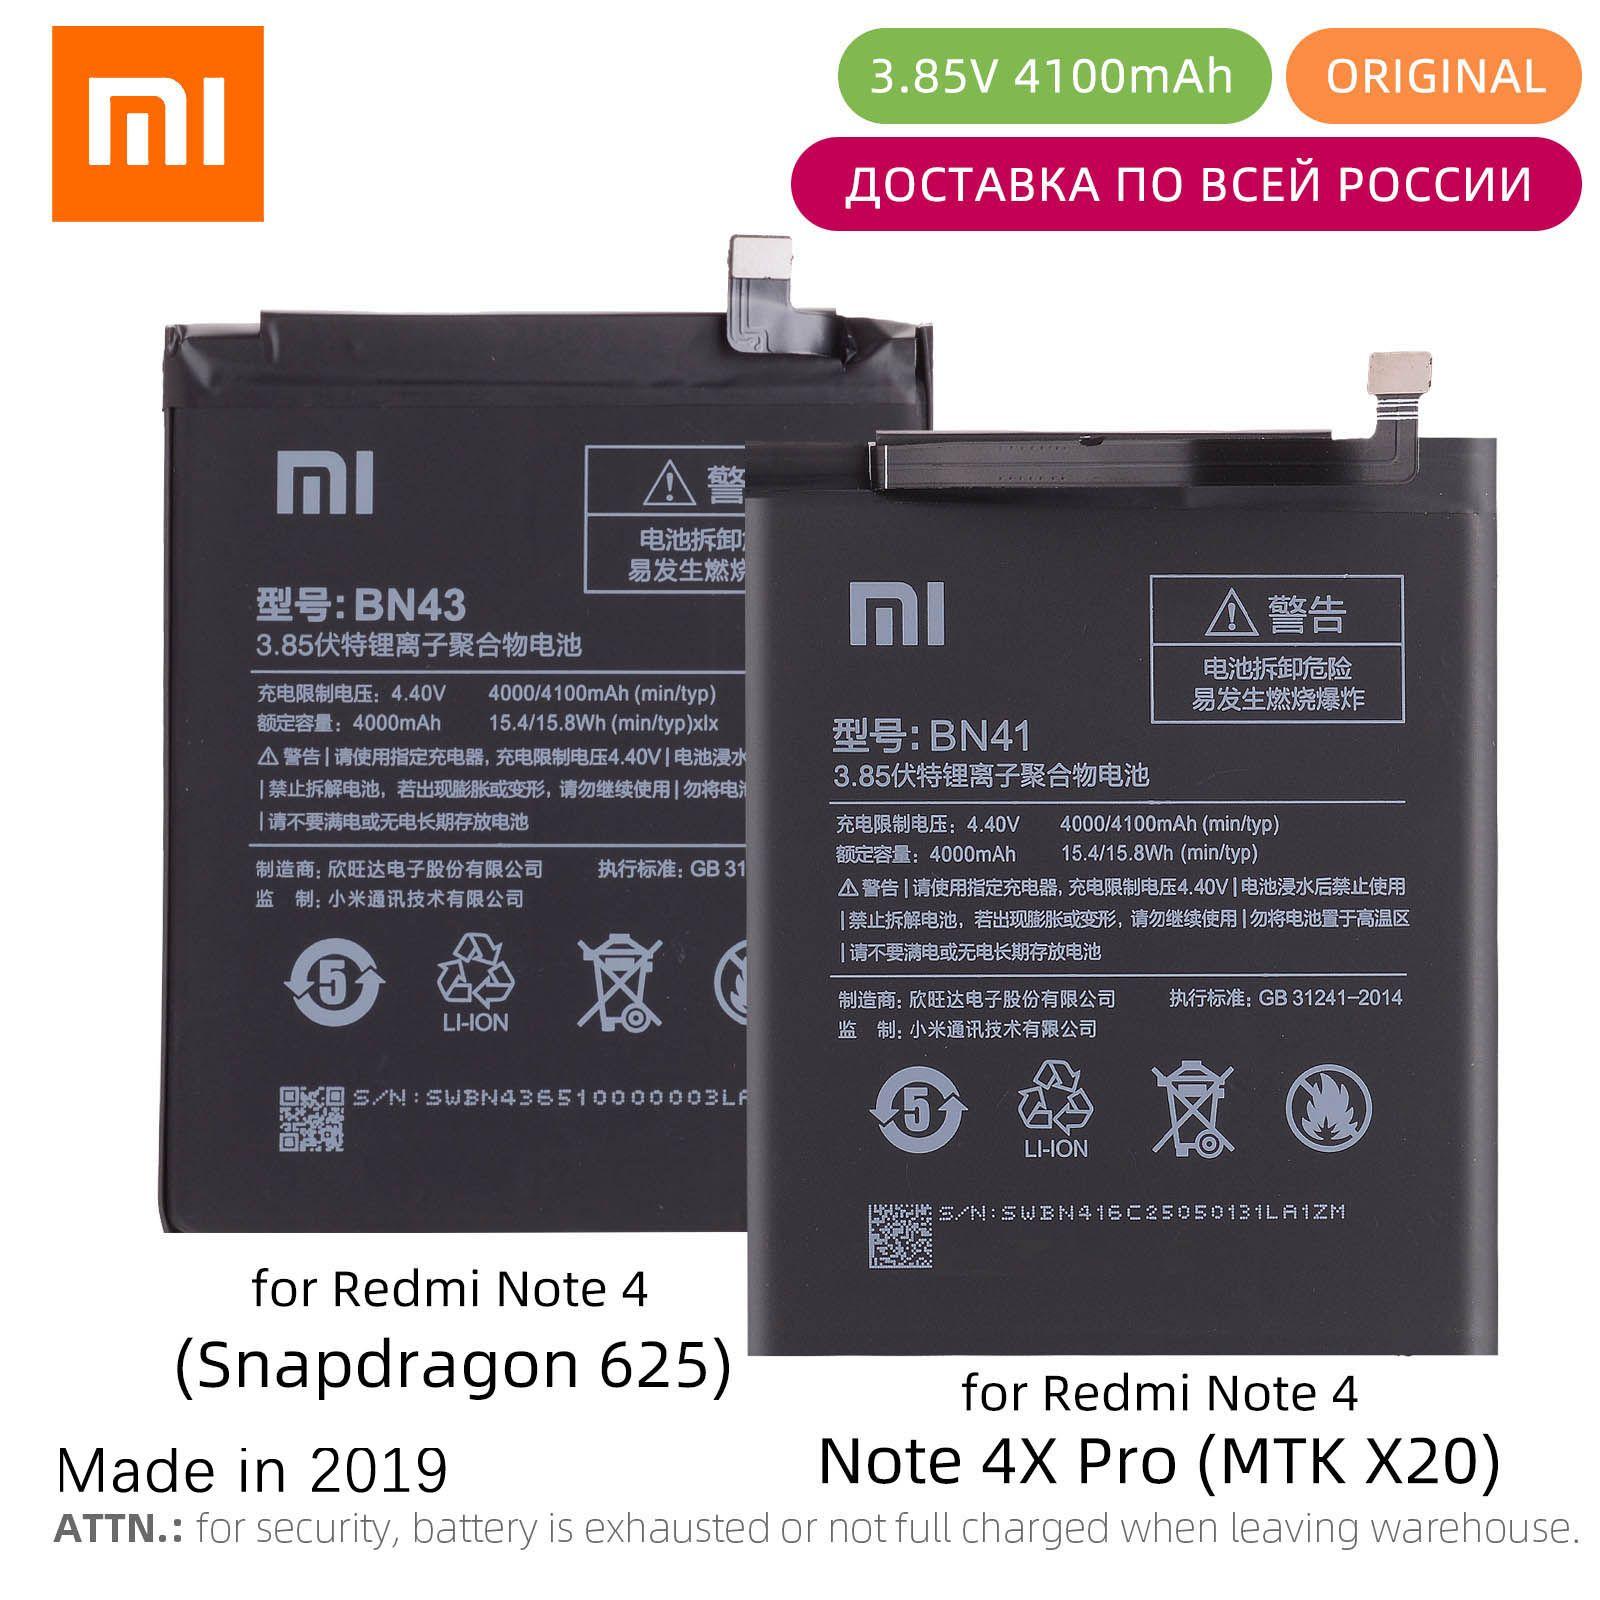 Original Pour Xiaomi Redmi Note 4 Batterie 4100mAh BN43 Remplacement pour Xiaomi Redmi Note 4X Batterie Xiaomi Redmi Note 4X Pro BN41